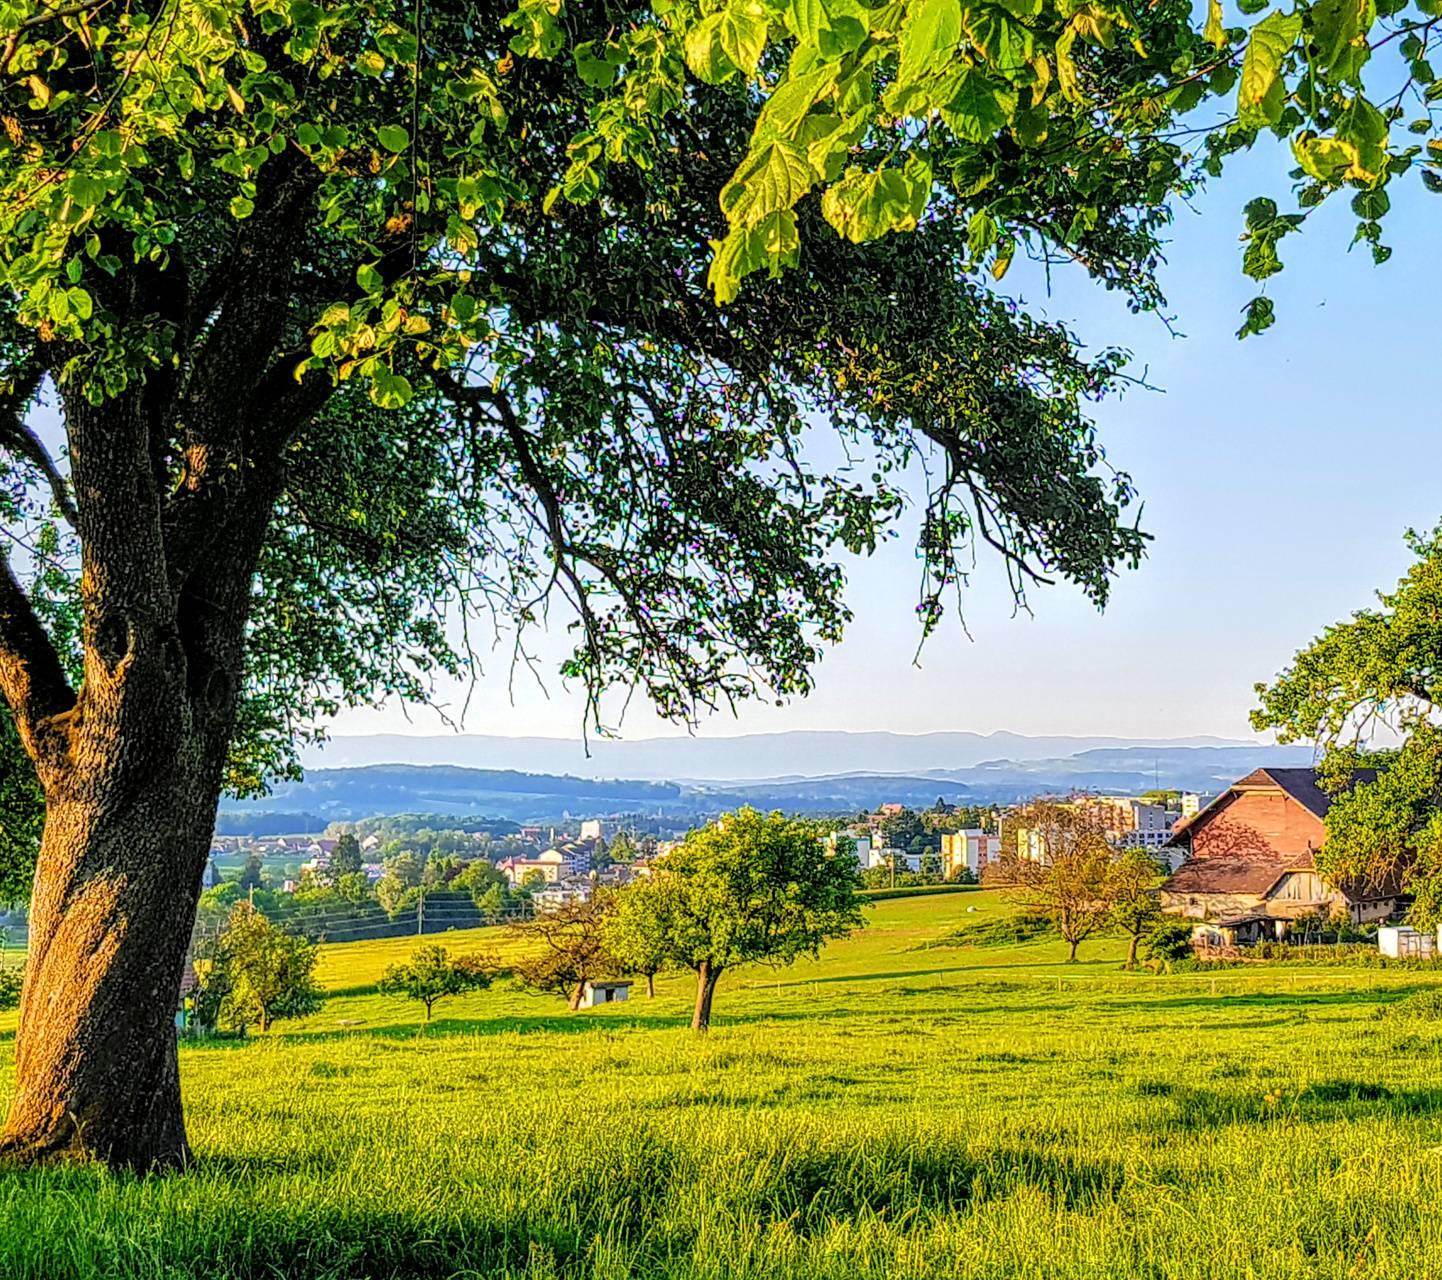 Villars-sur-glane